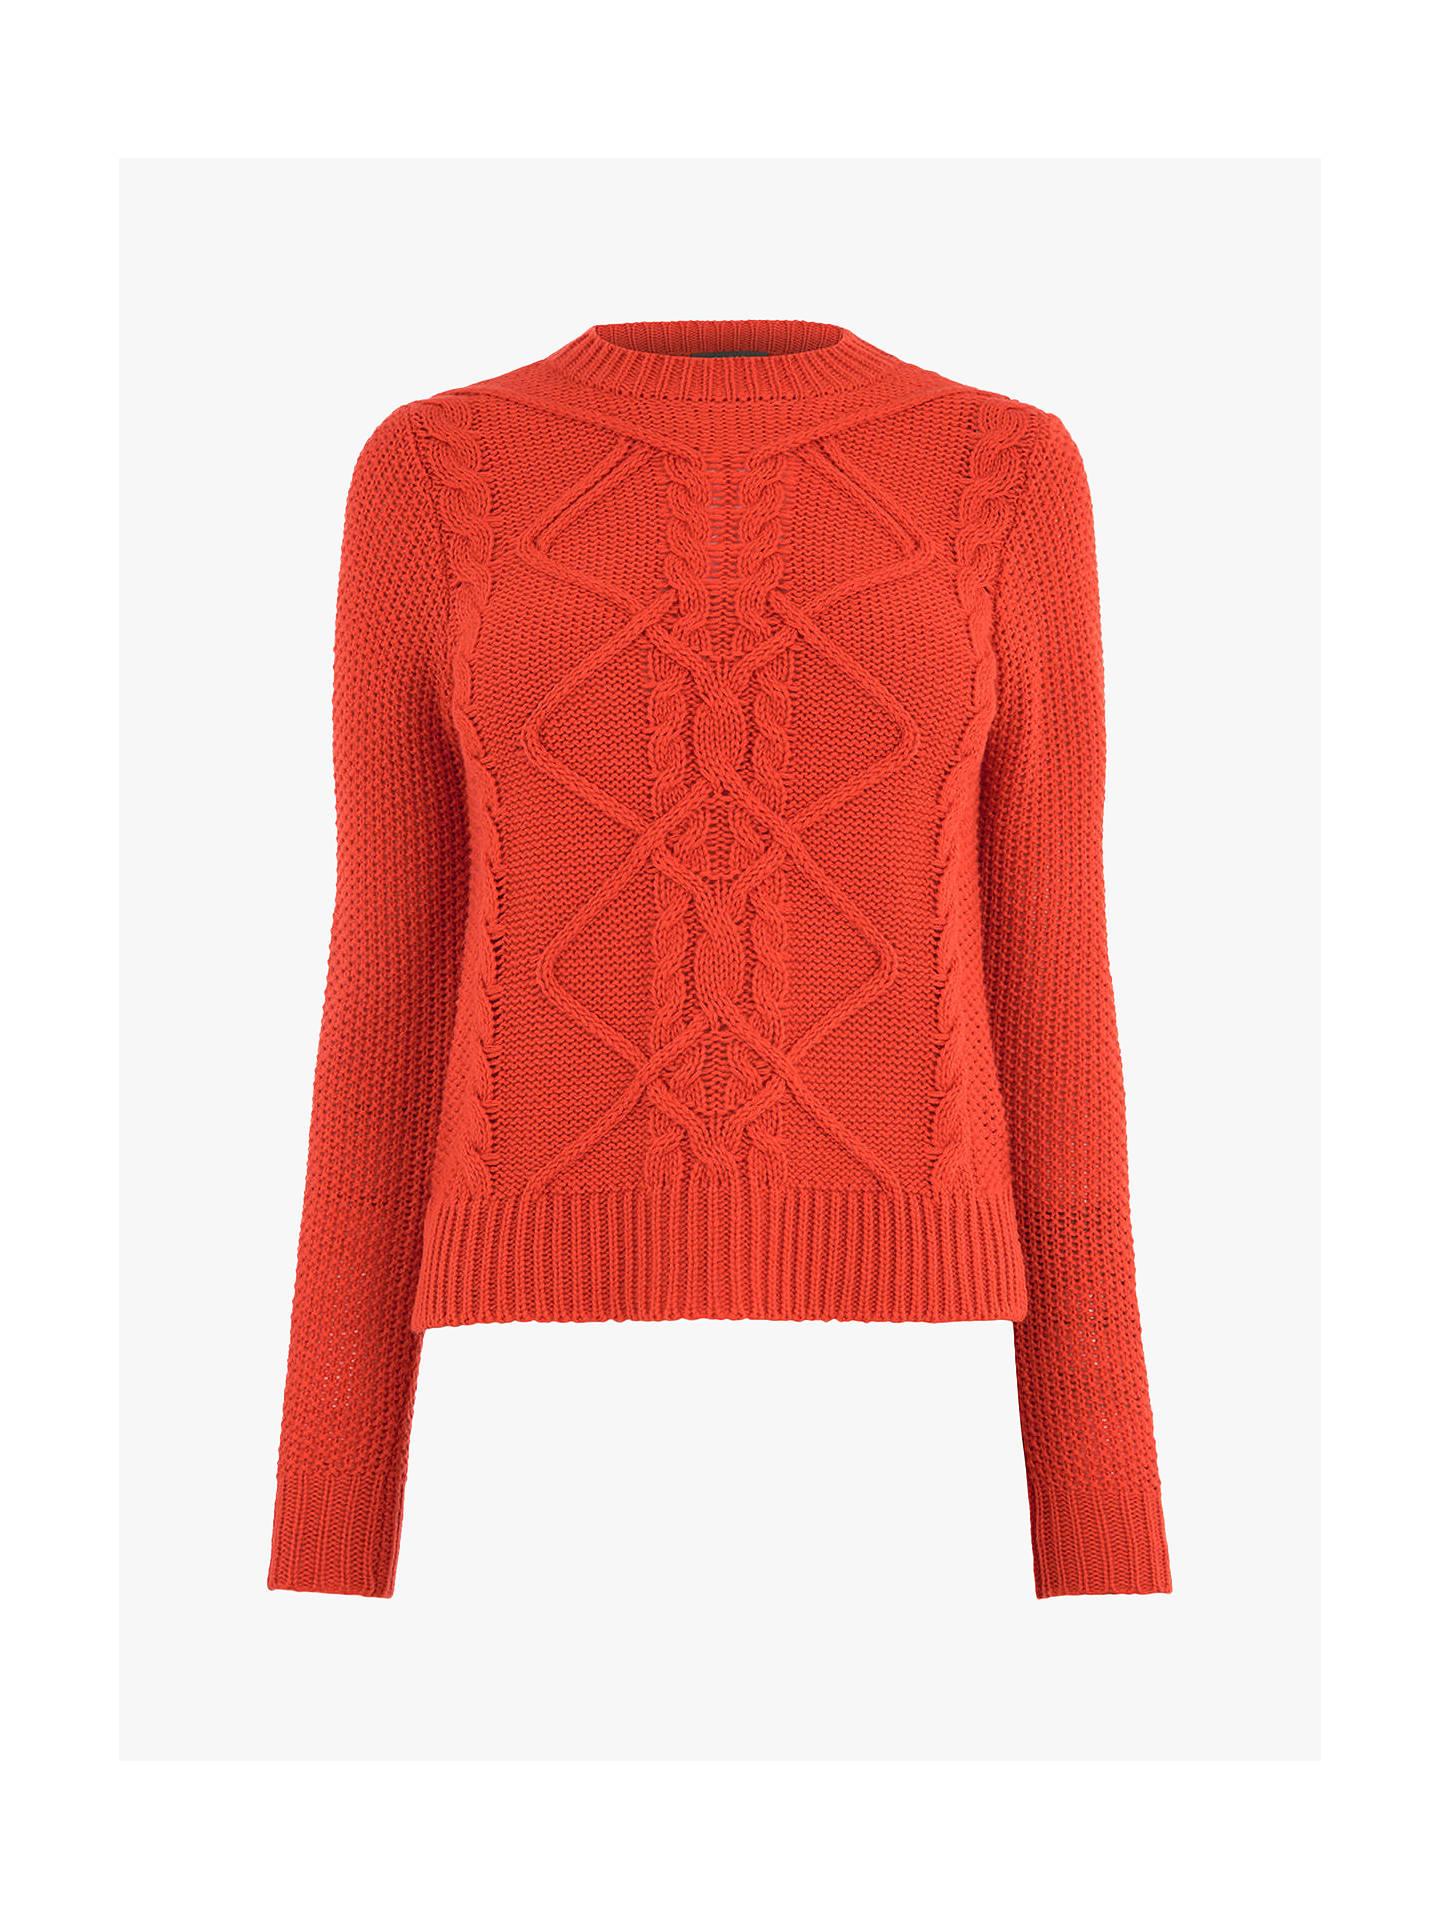 324fca8b3d43 ... Buy Oasis Nyla Cable Knit Jumper, Bright Orange, S Online at  johnlewis.com ...